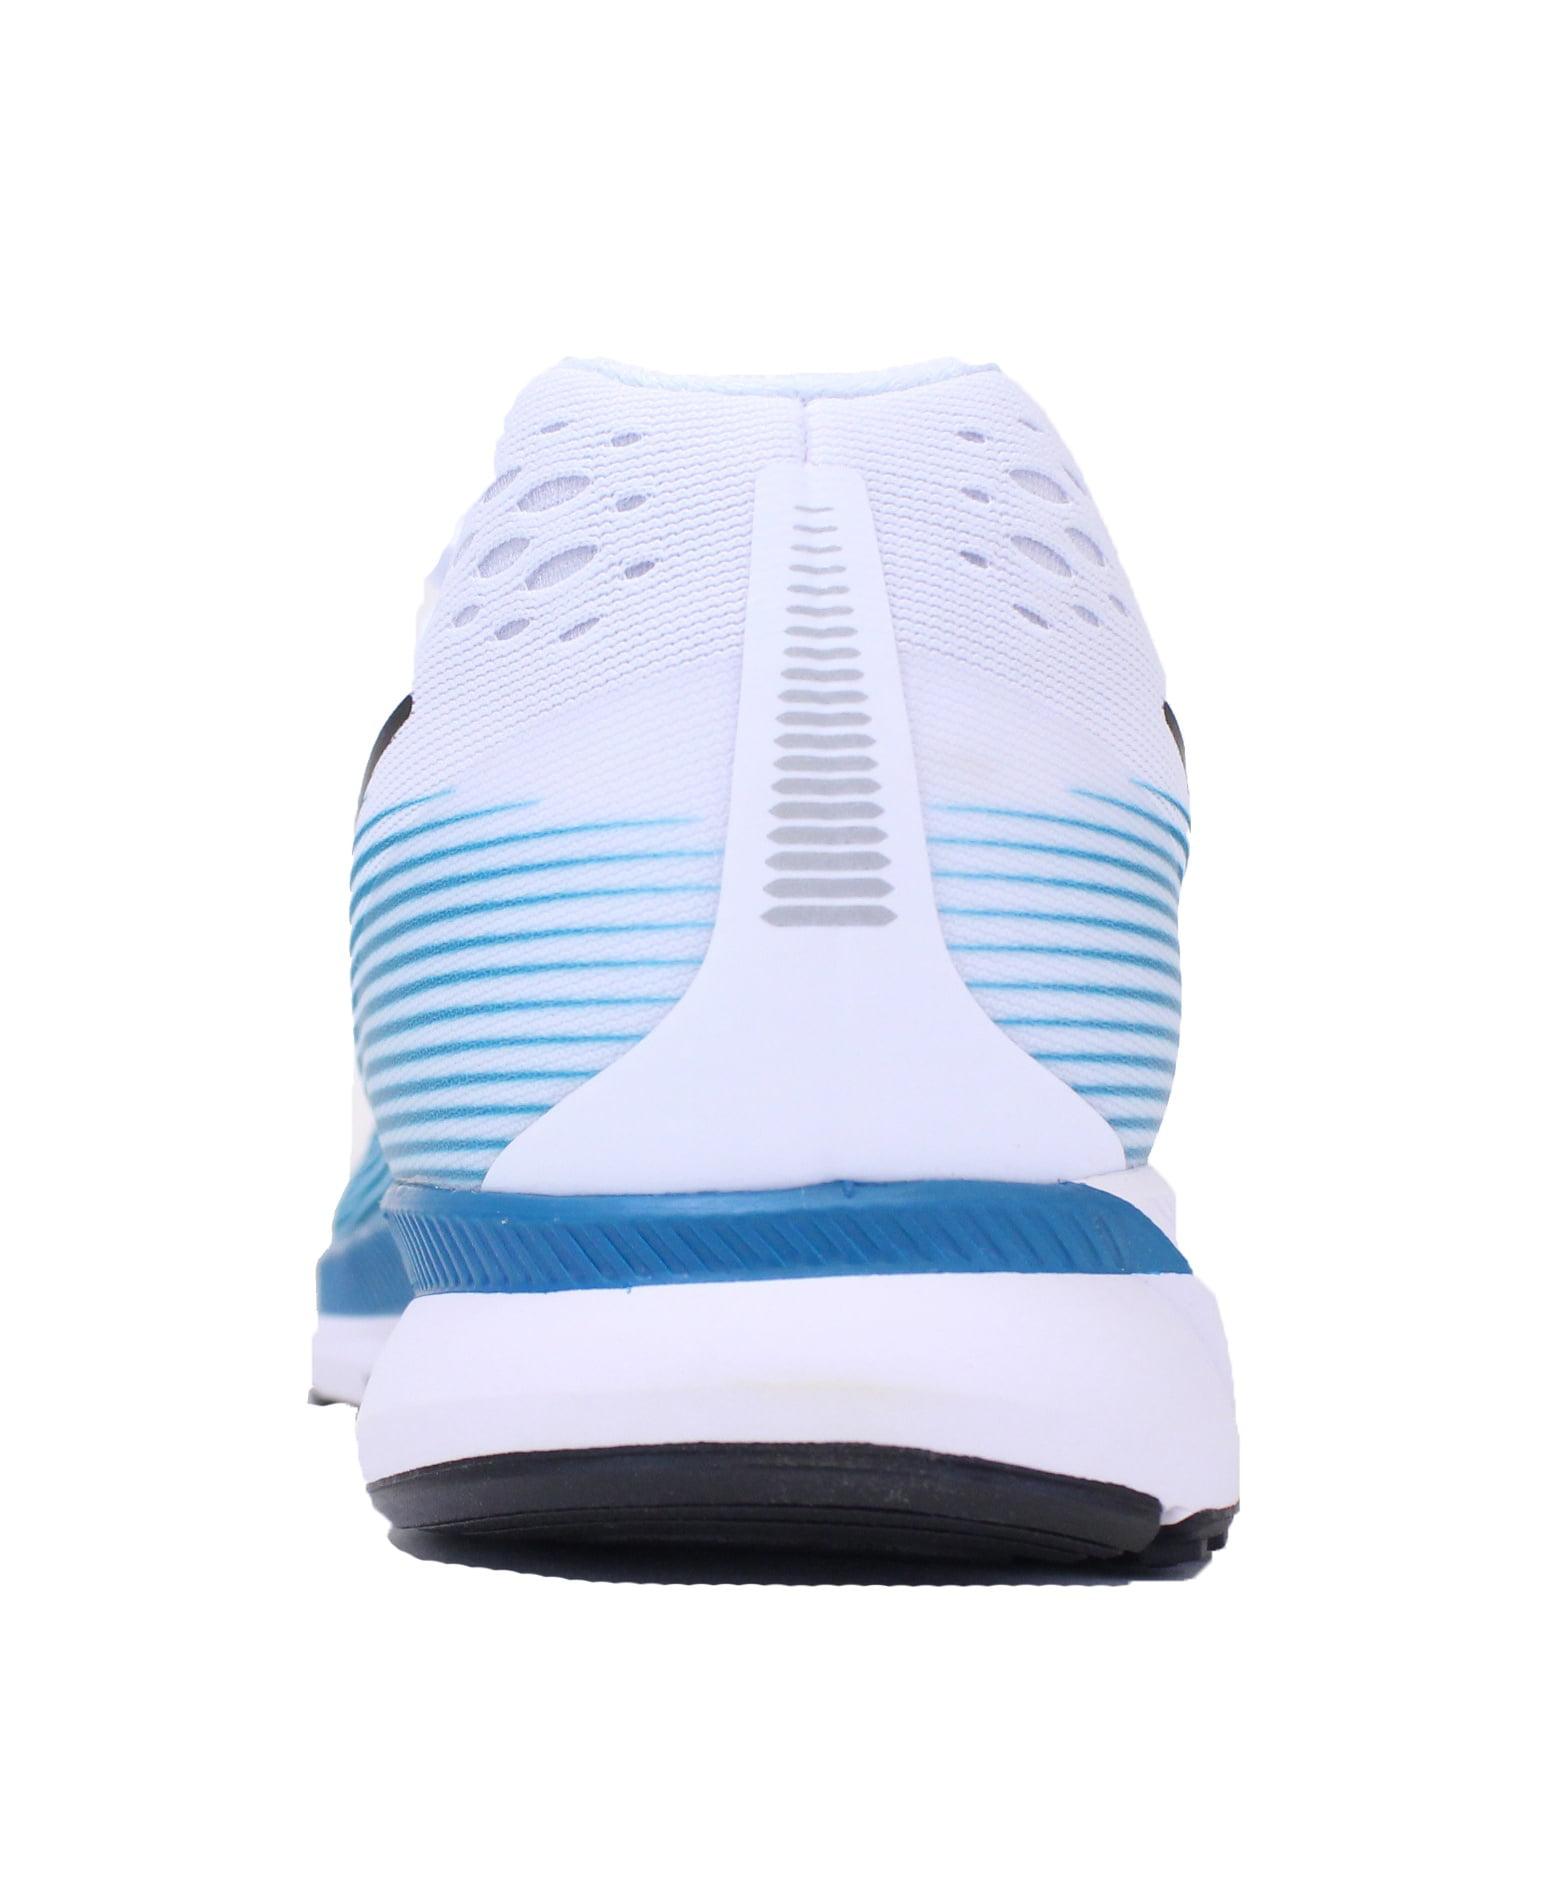 NIKE AIR ZOOM PEGASUS 34 SZ 14 BLUSTERY BLUE WHITE BLACK RUNNING SHOE 880555 101